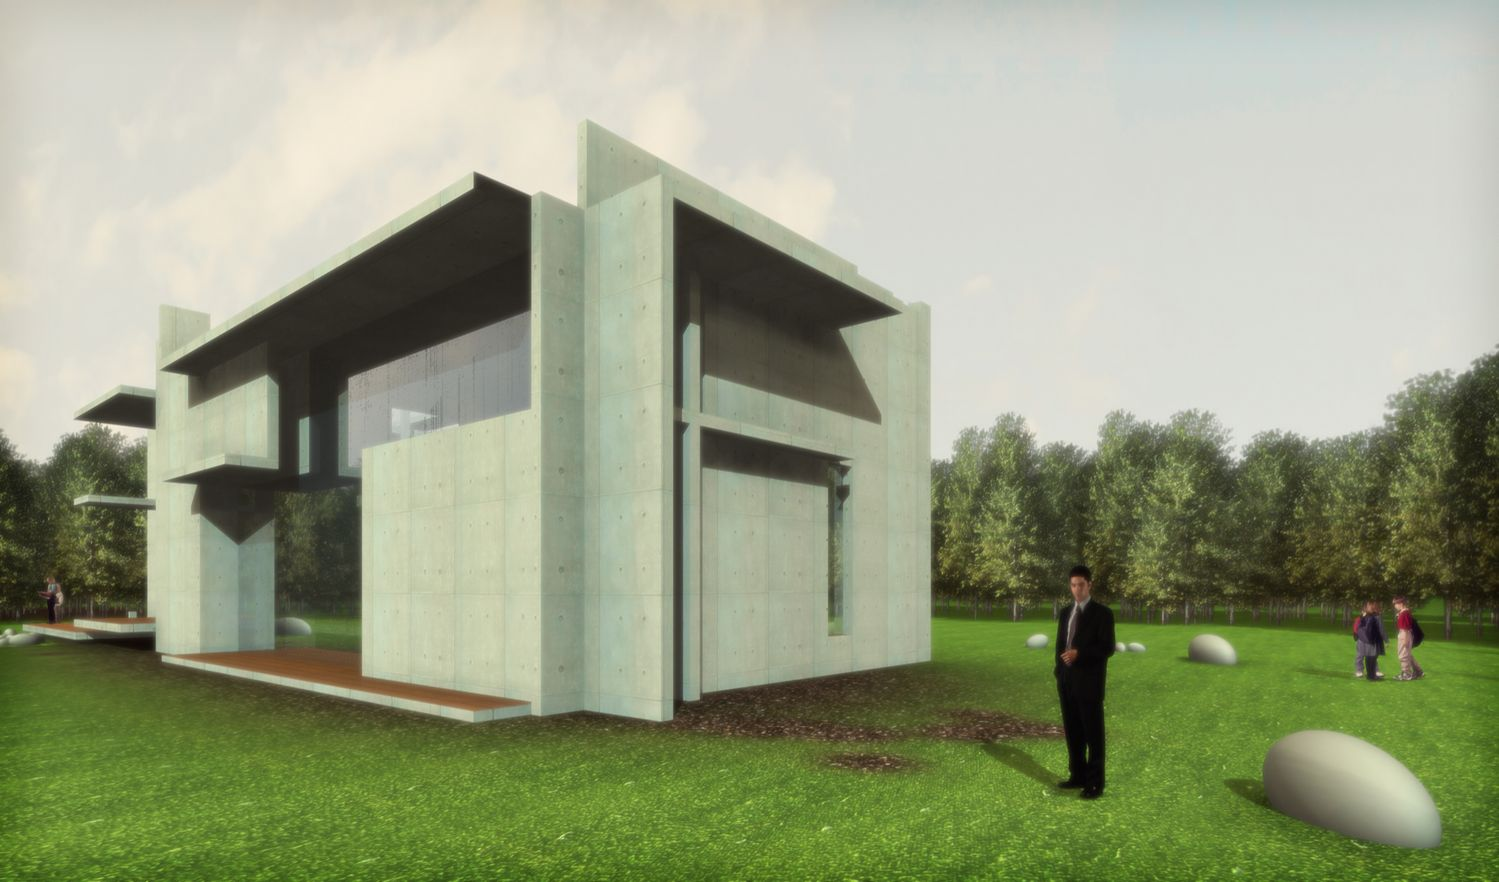 Diego del Castillo - Mondrian House II - oaudarq-20.jpg